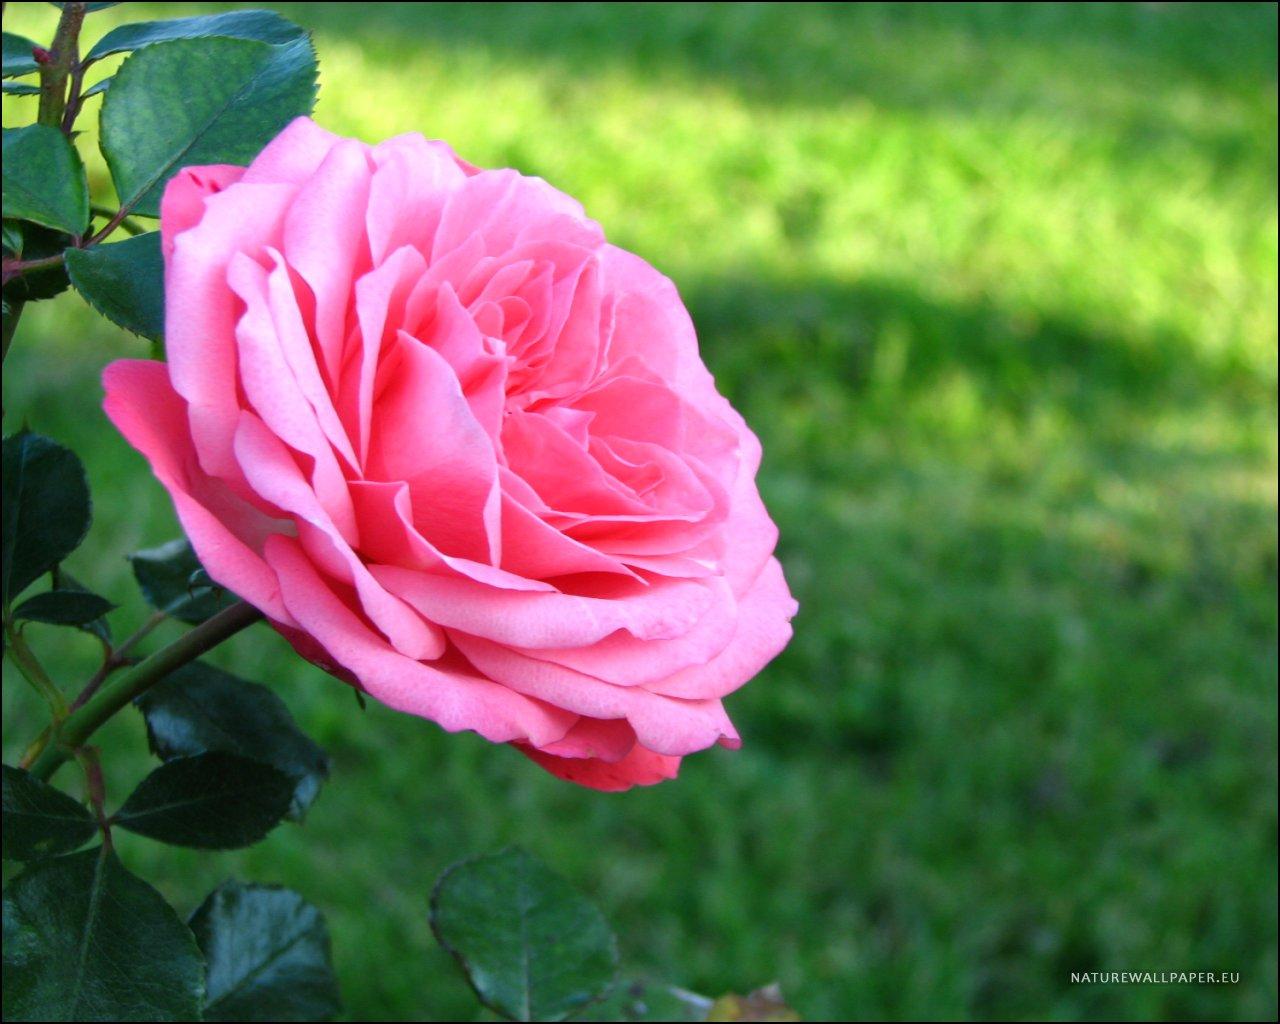 1280x1024 wallpaper Pink Rose Wallpaper Background 1280x1024